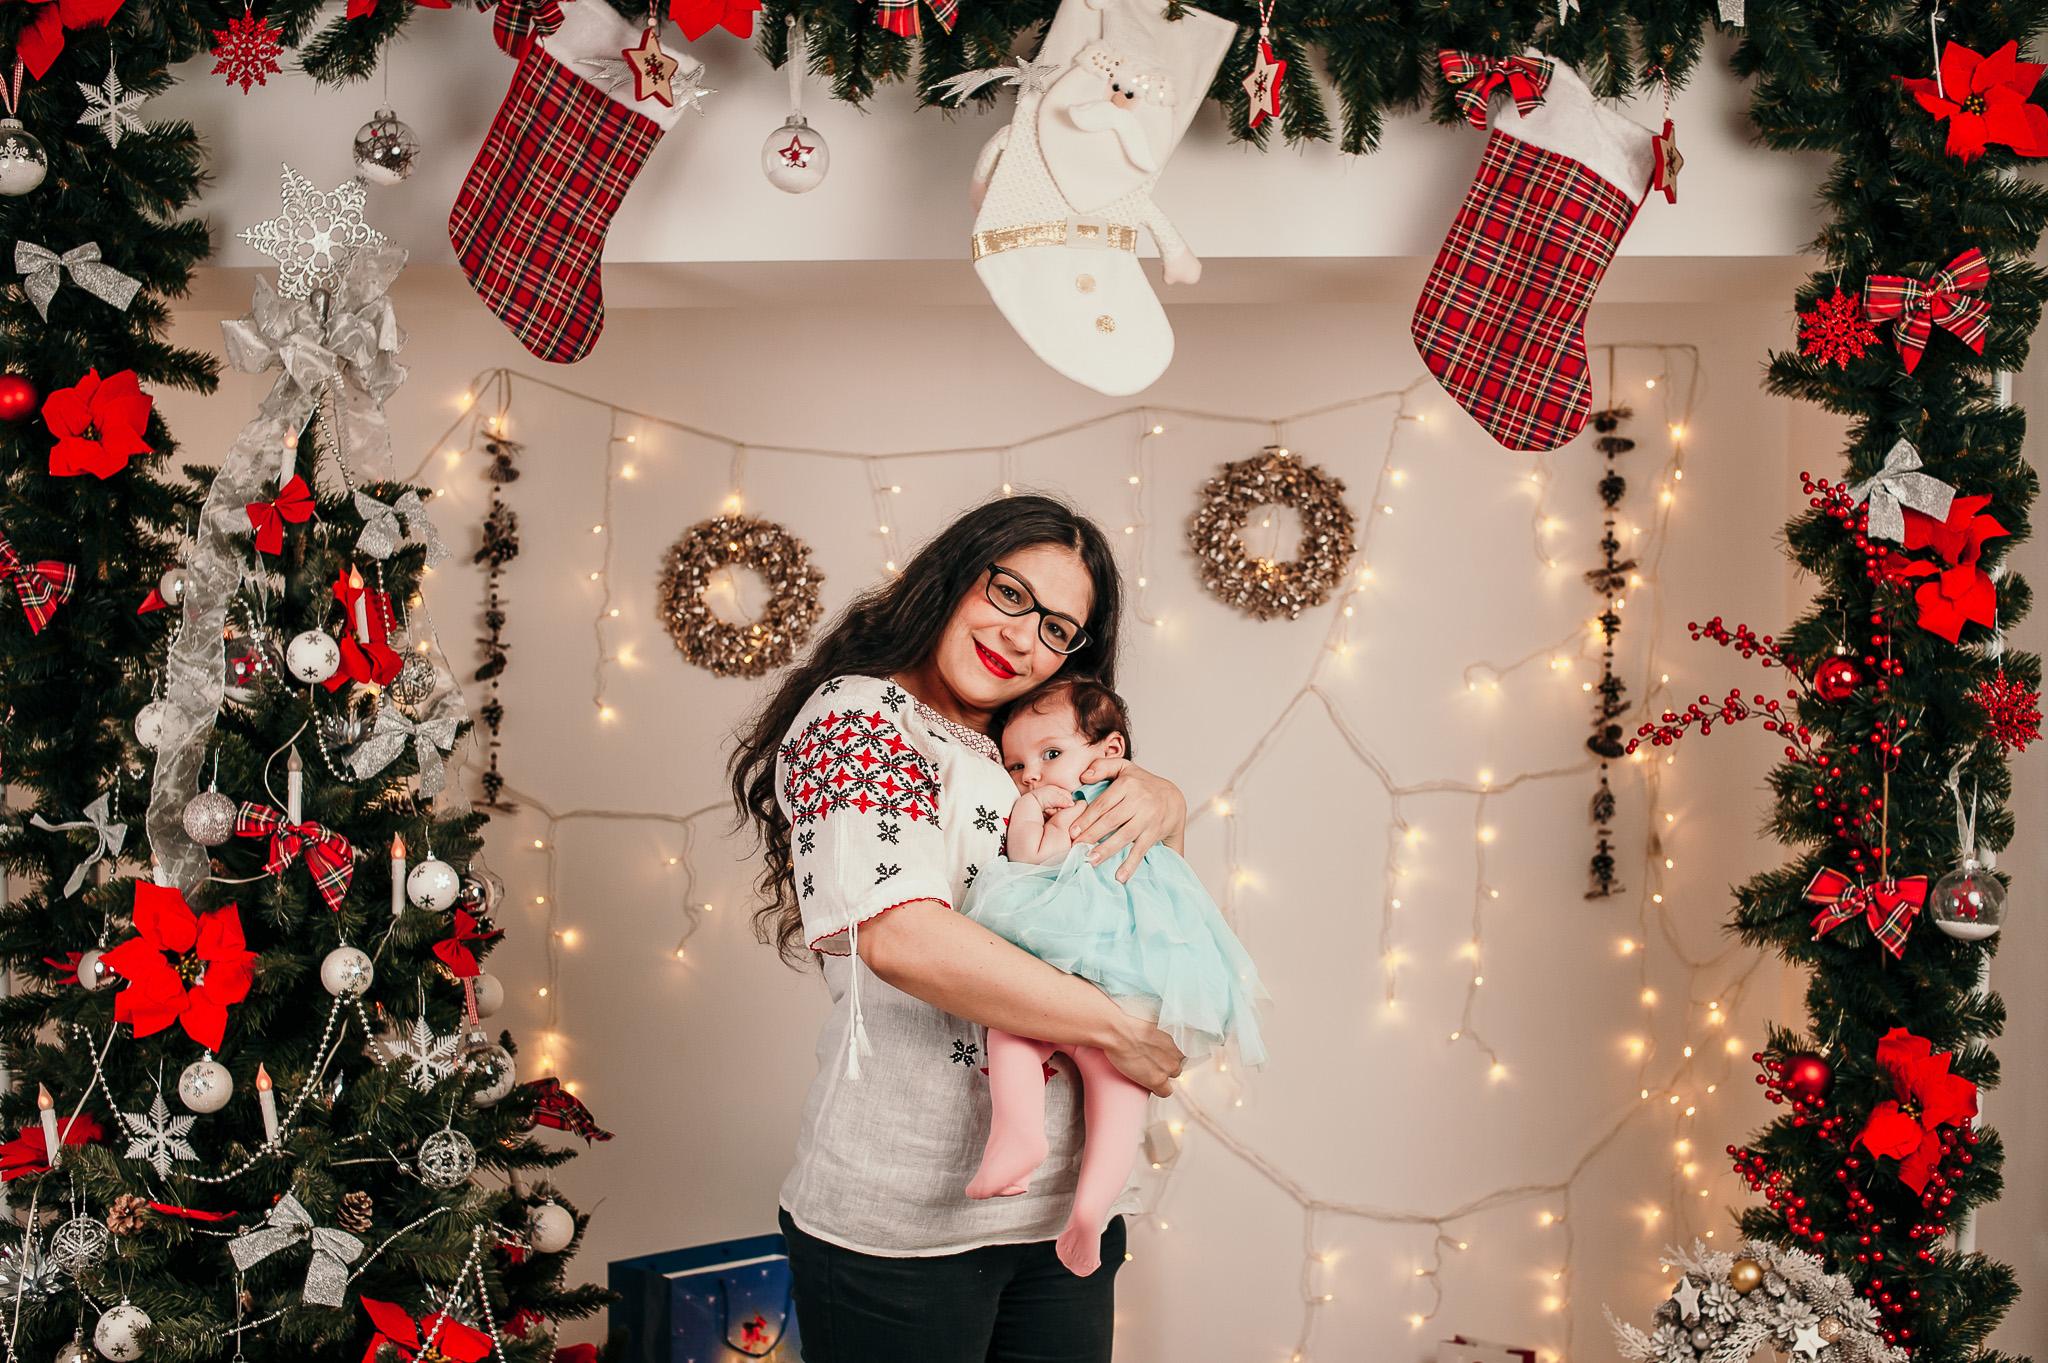 craciun 2019 poveste familie sedinta foto timisoara